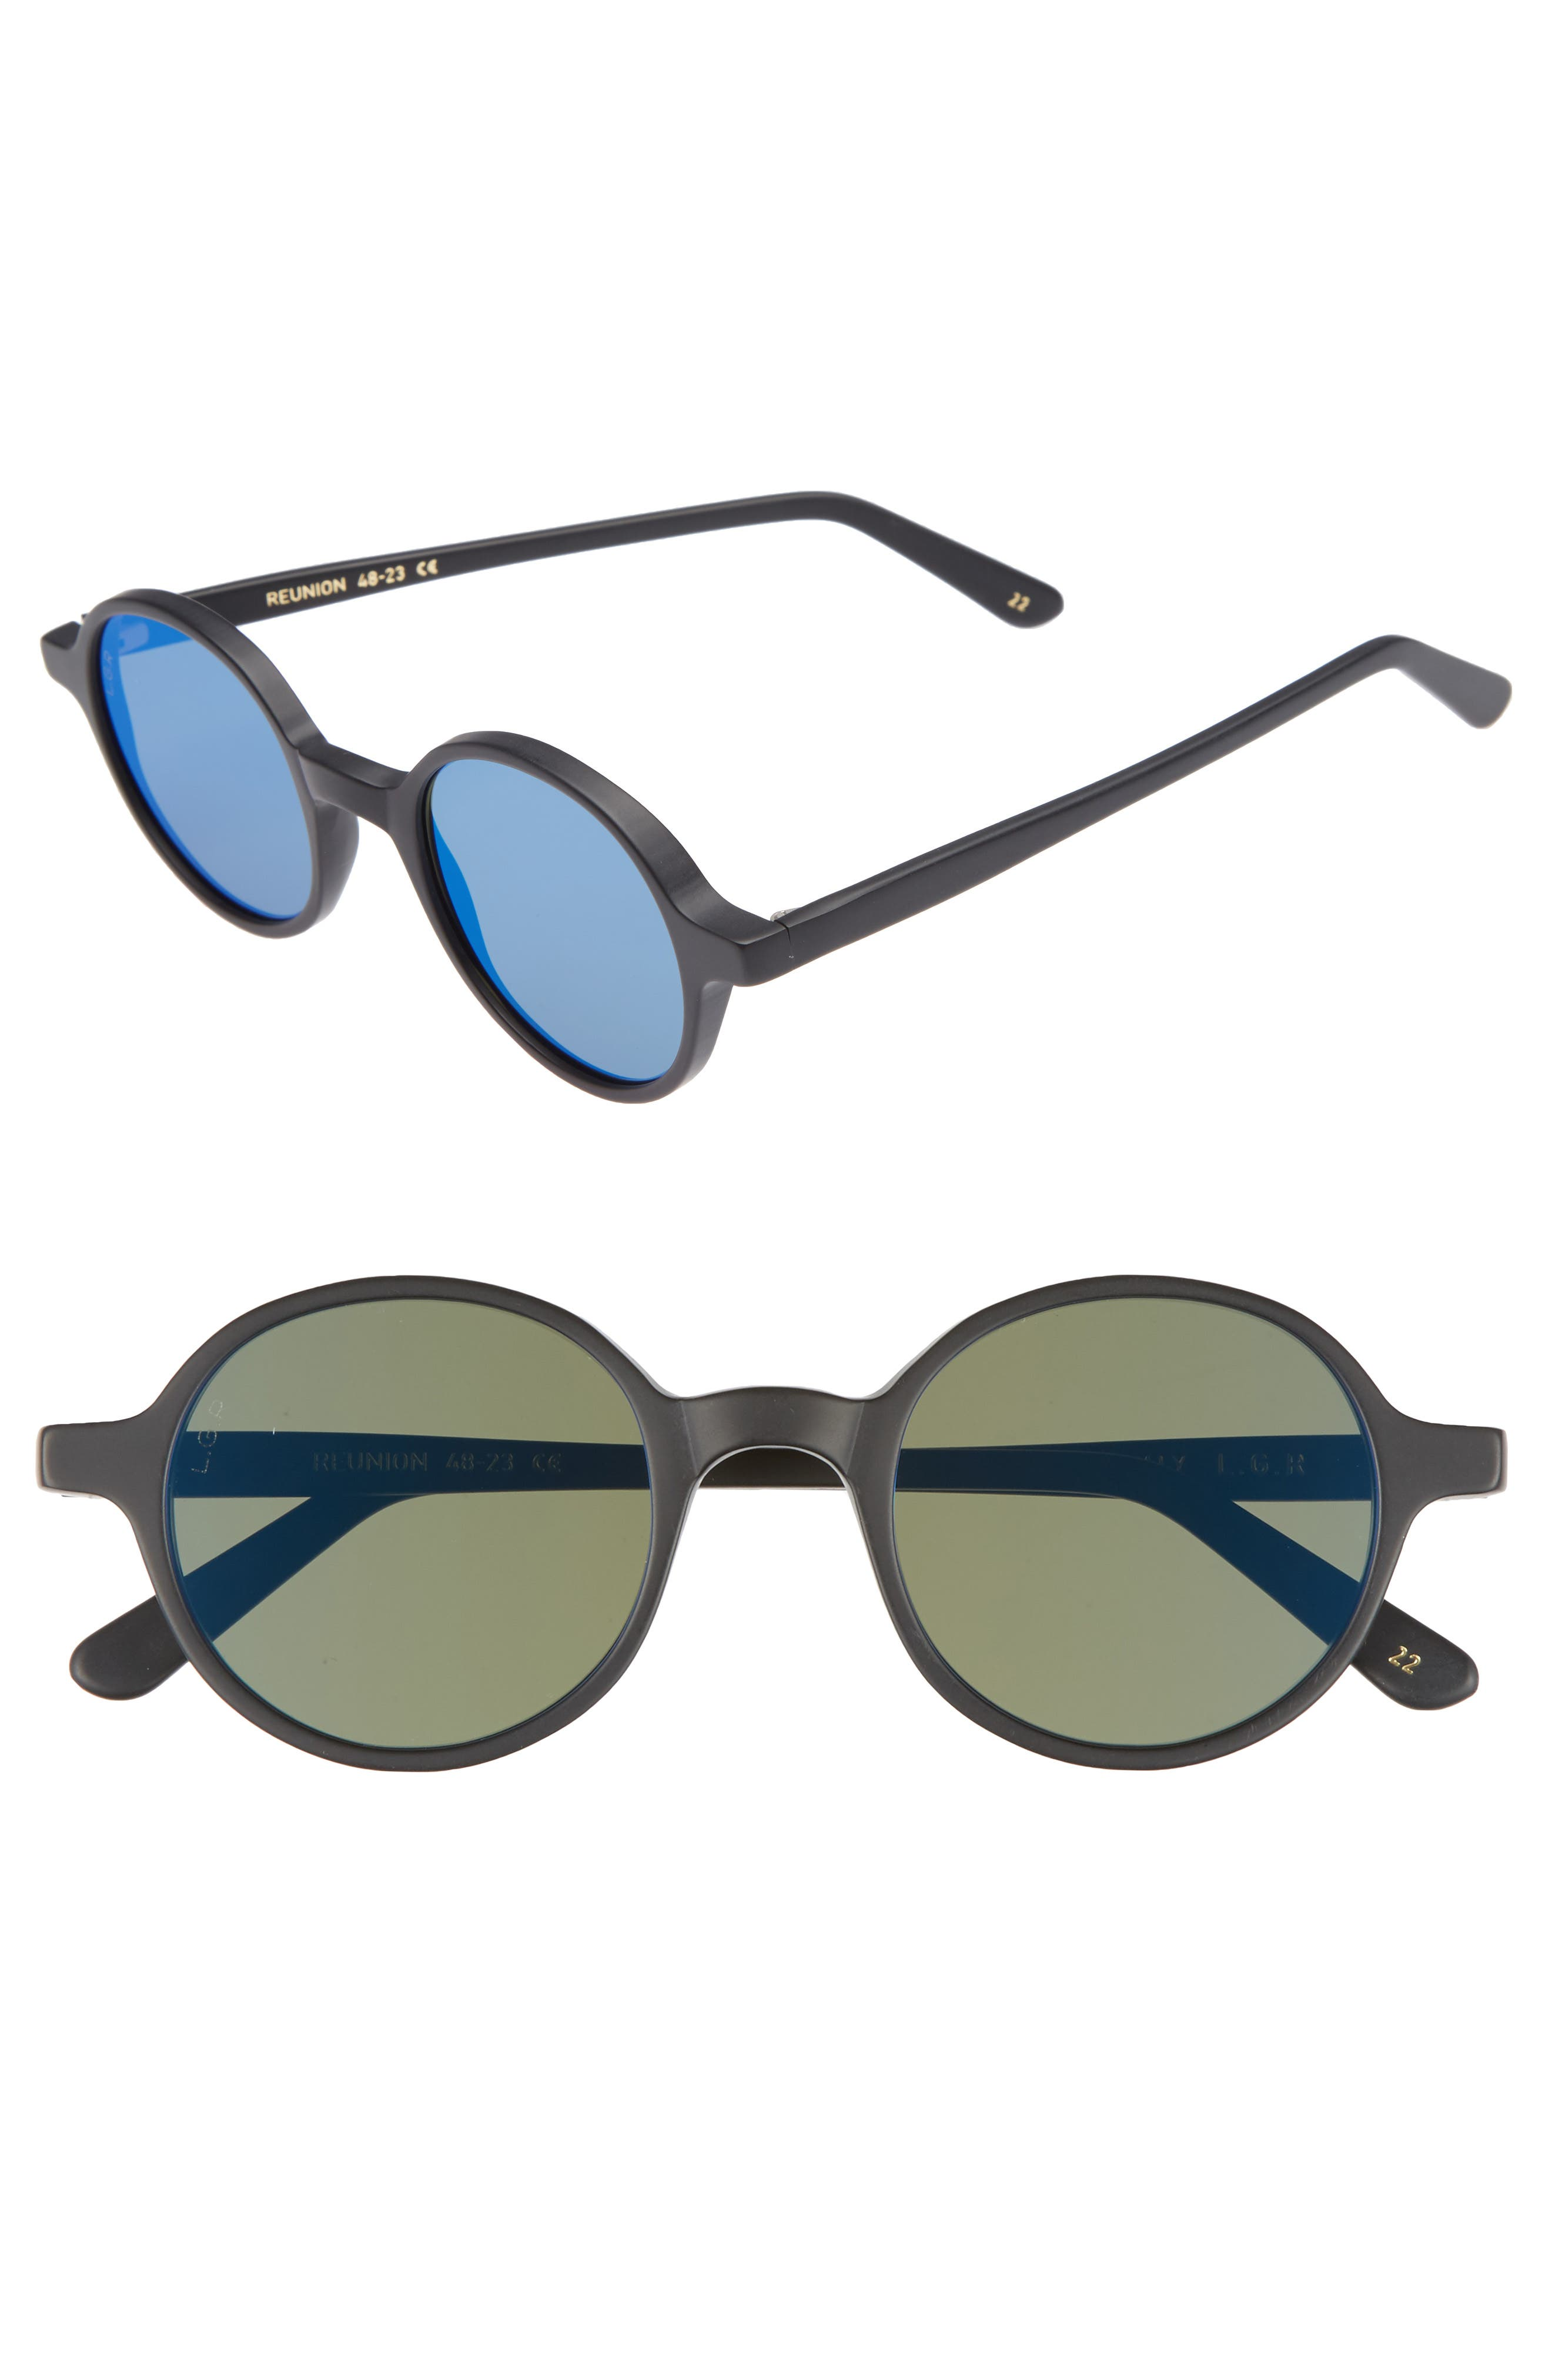 Main Image - L.G.R Reunion 48mm Sunglasses